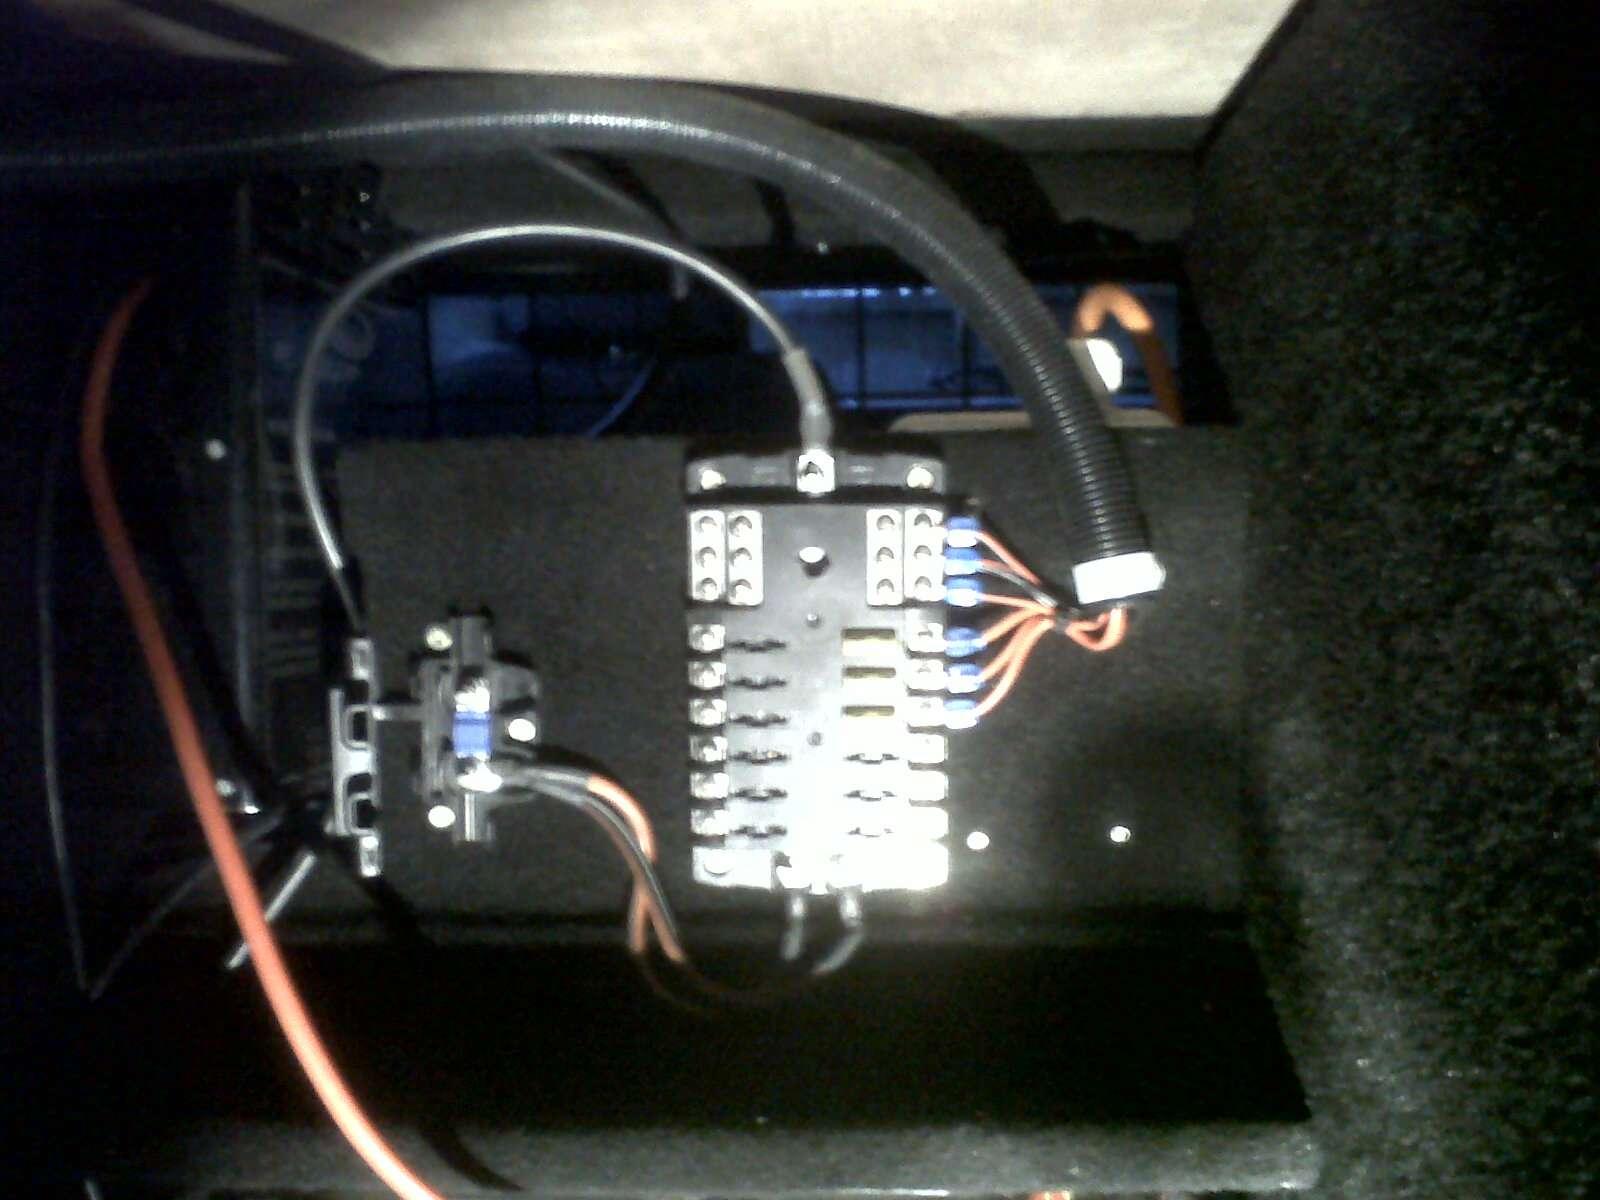 12v Fused Distribution Board International Forum Lr4x4 The Defender Fuse Box Ebay Img00372201205062044